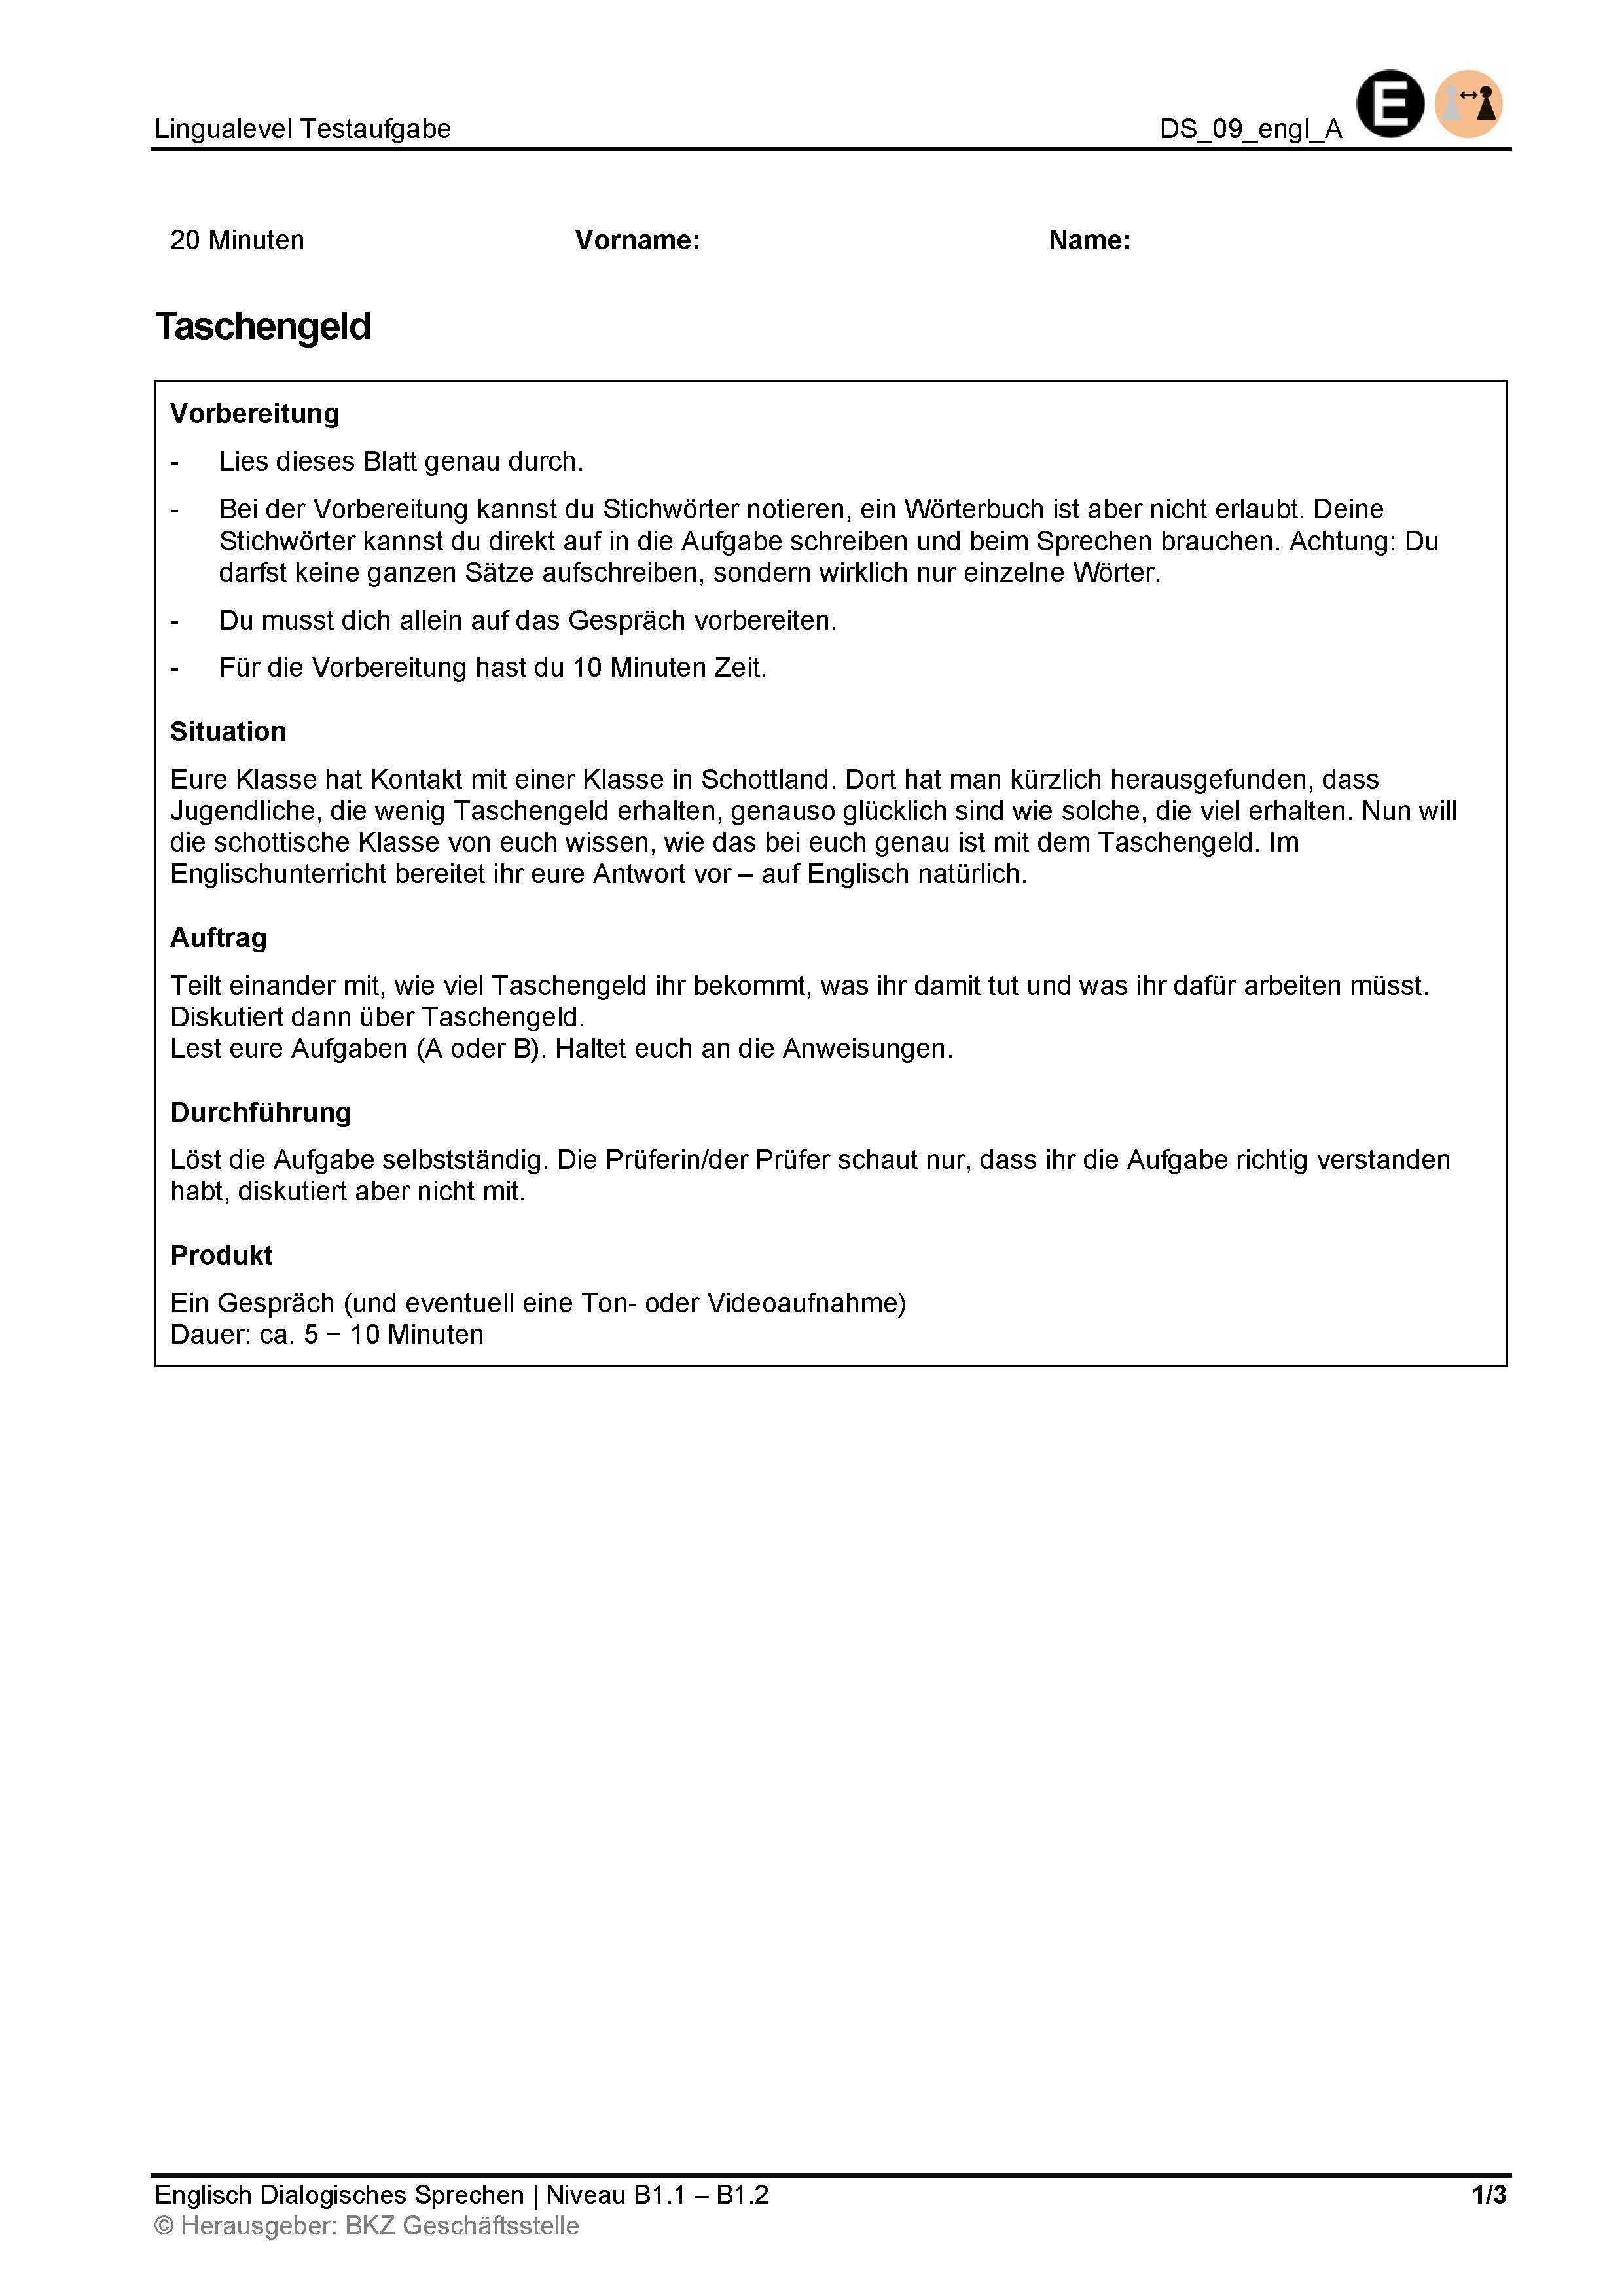 Preview image for LOM object Dialogisches Sprechen: Taschengeld